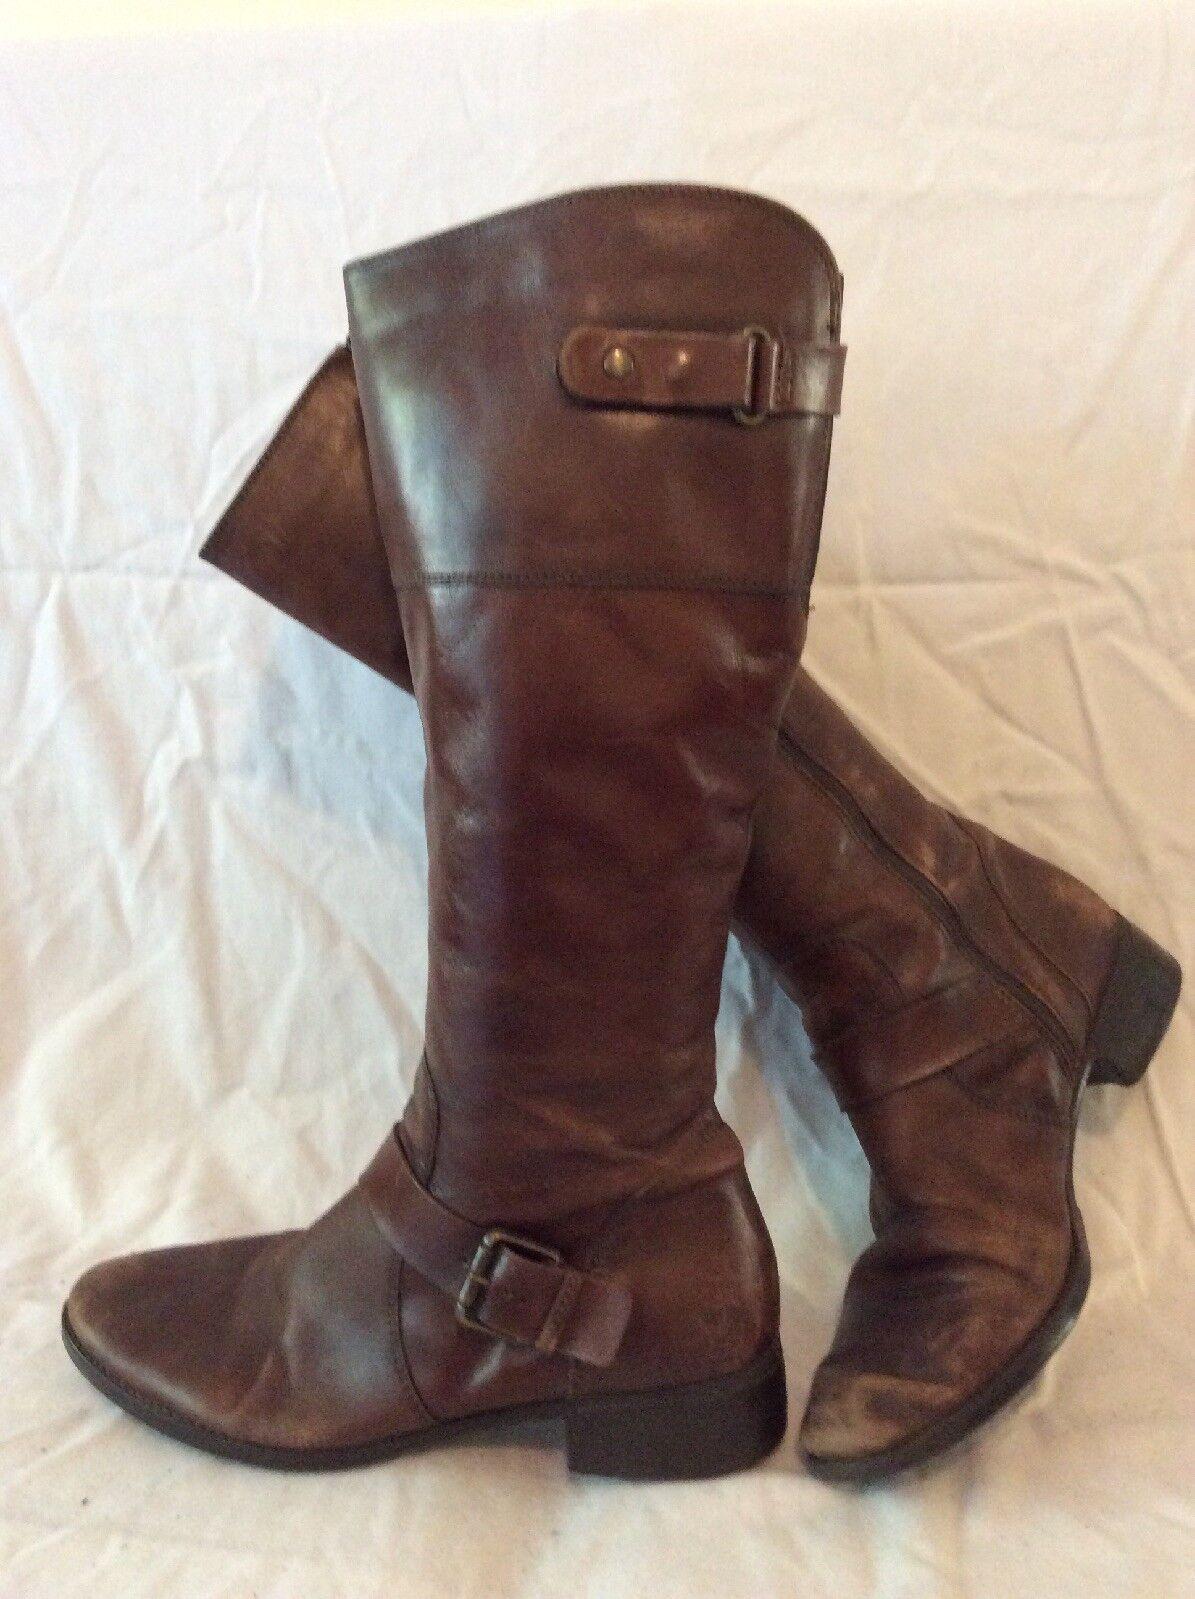 Jones Bootmaker Brown Knee High Leather Boots Size 40